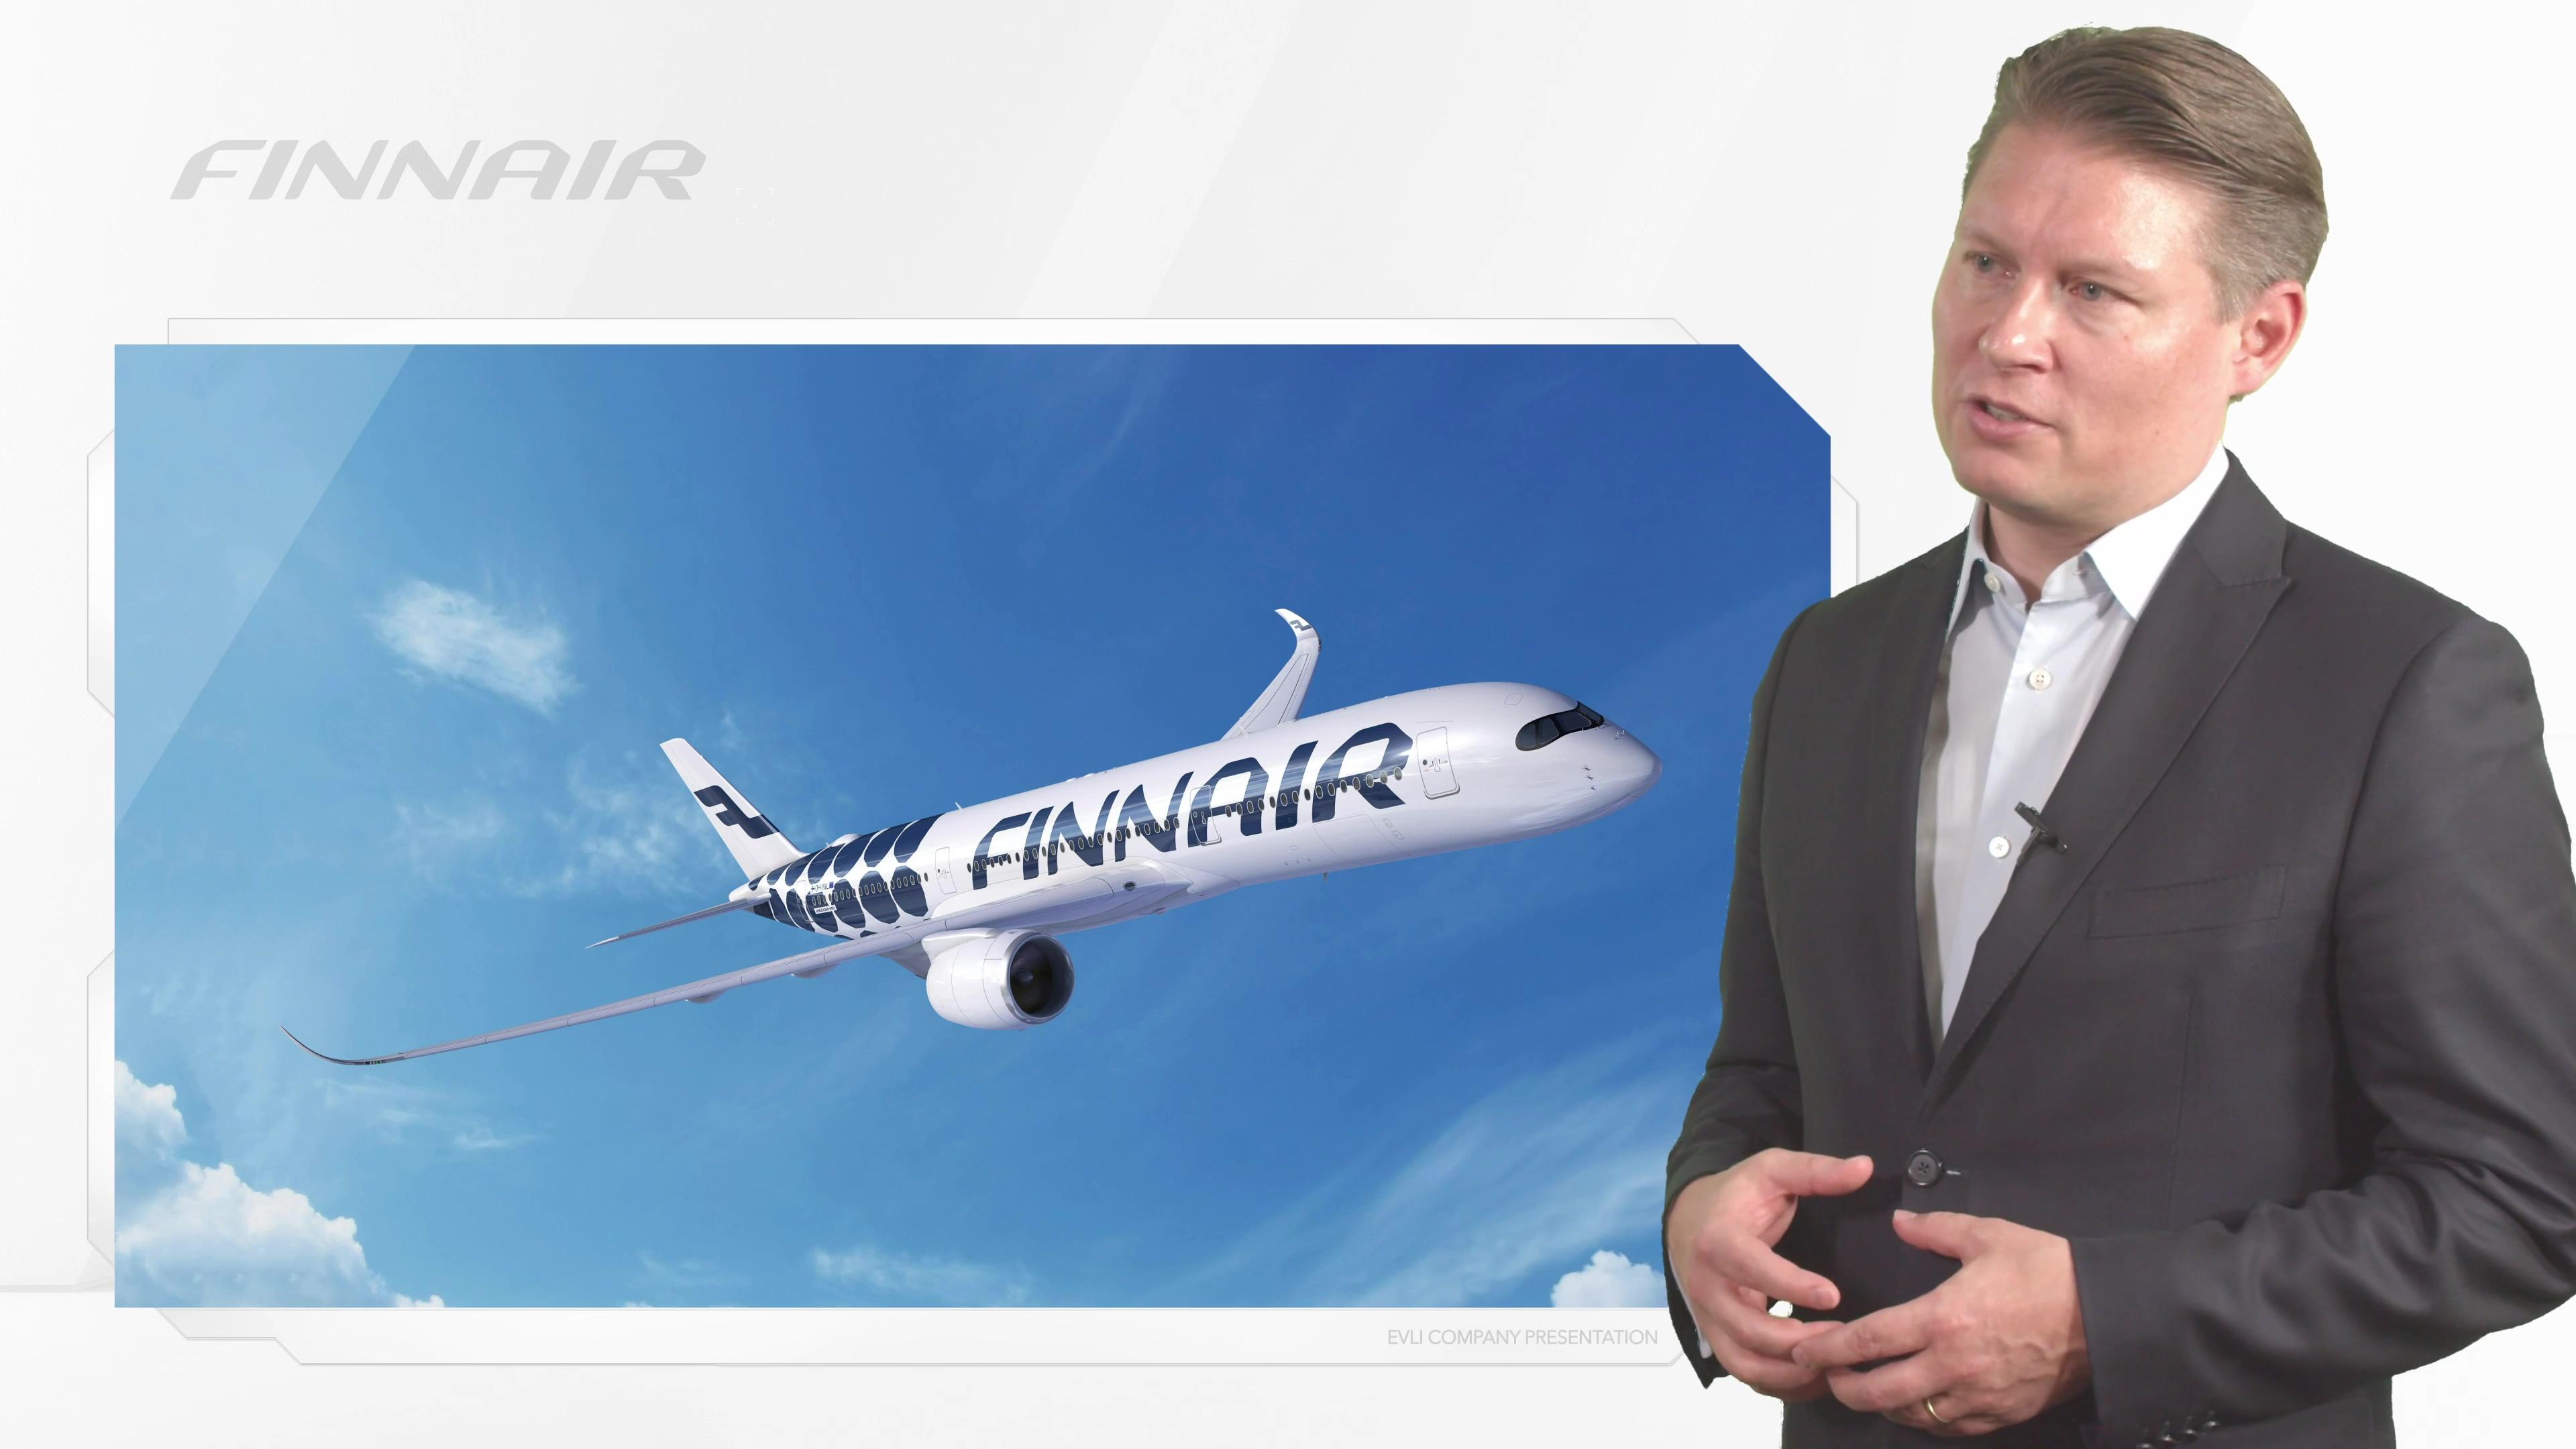 Finnair company presentation 13032020